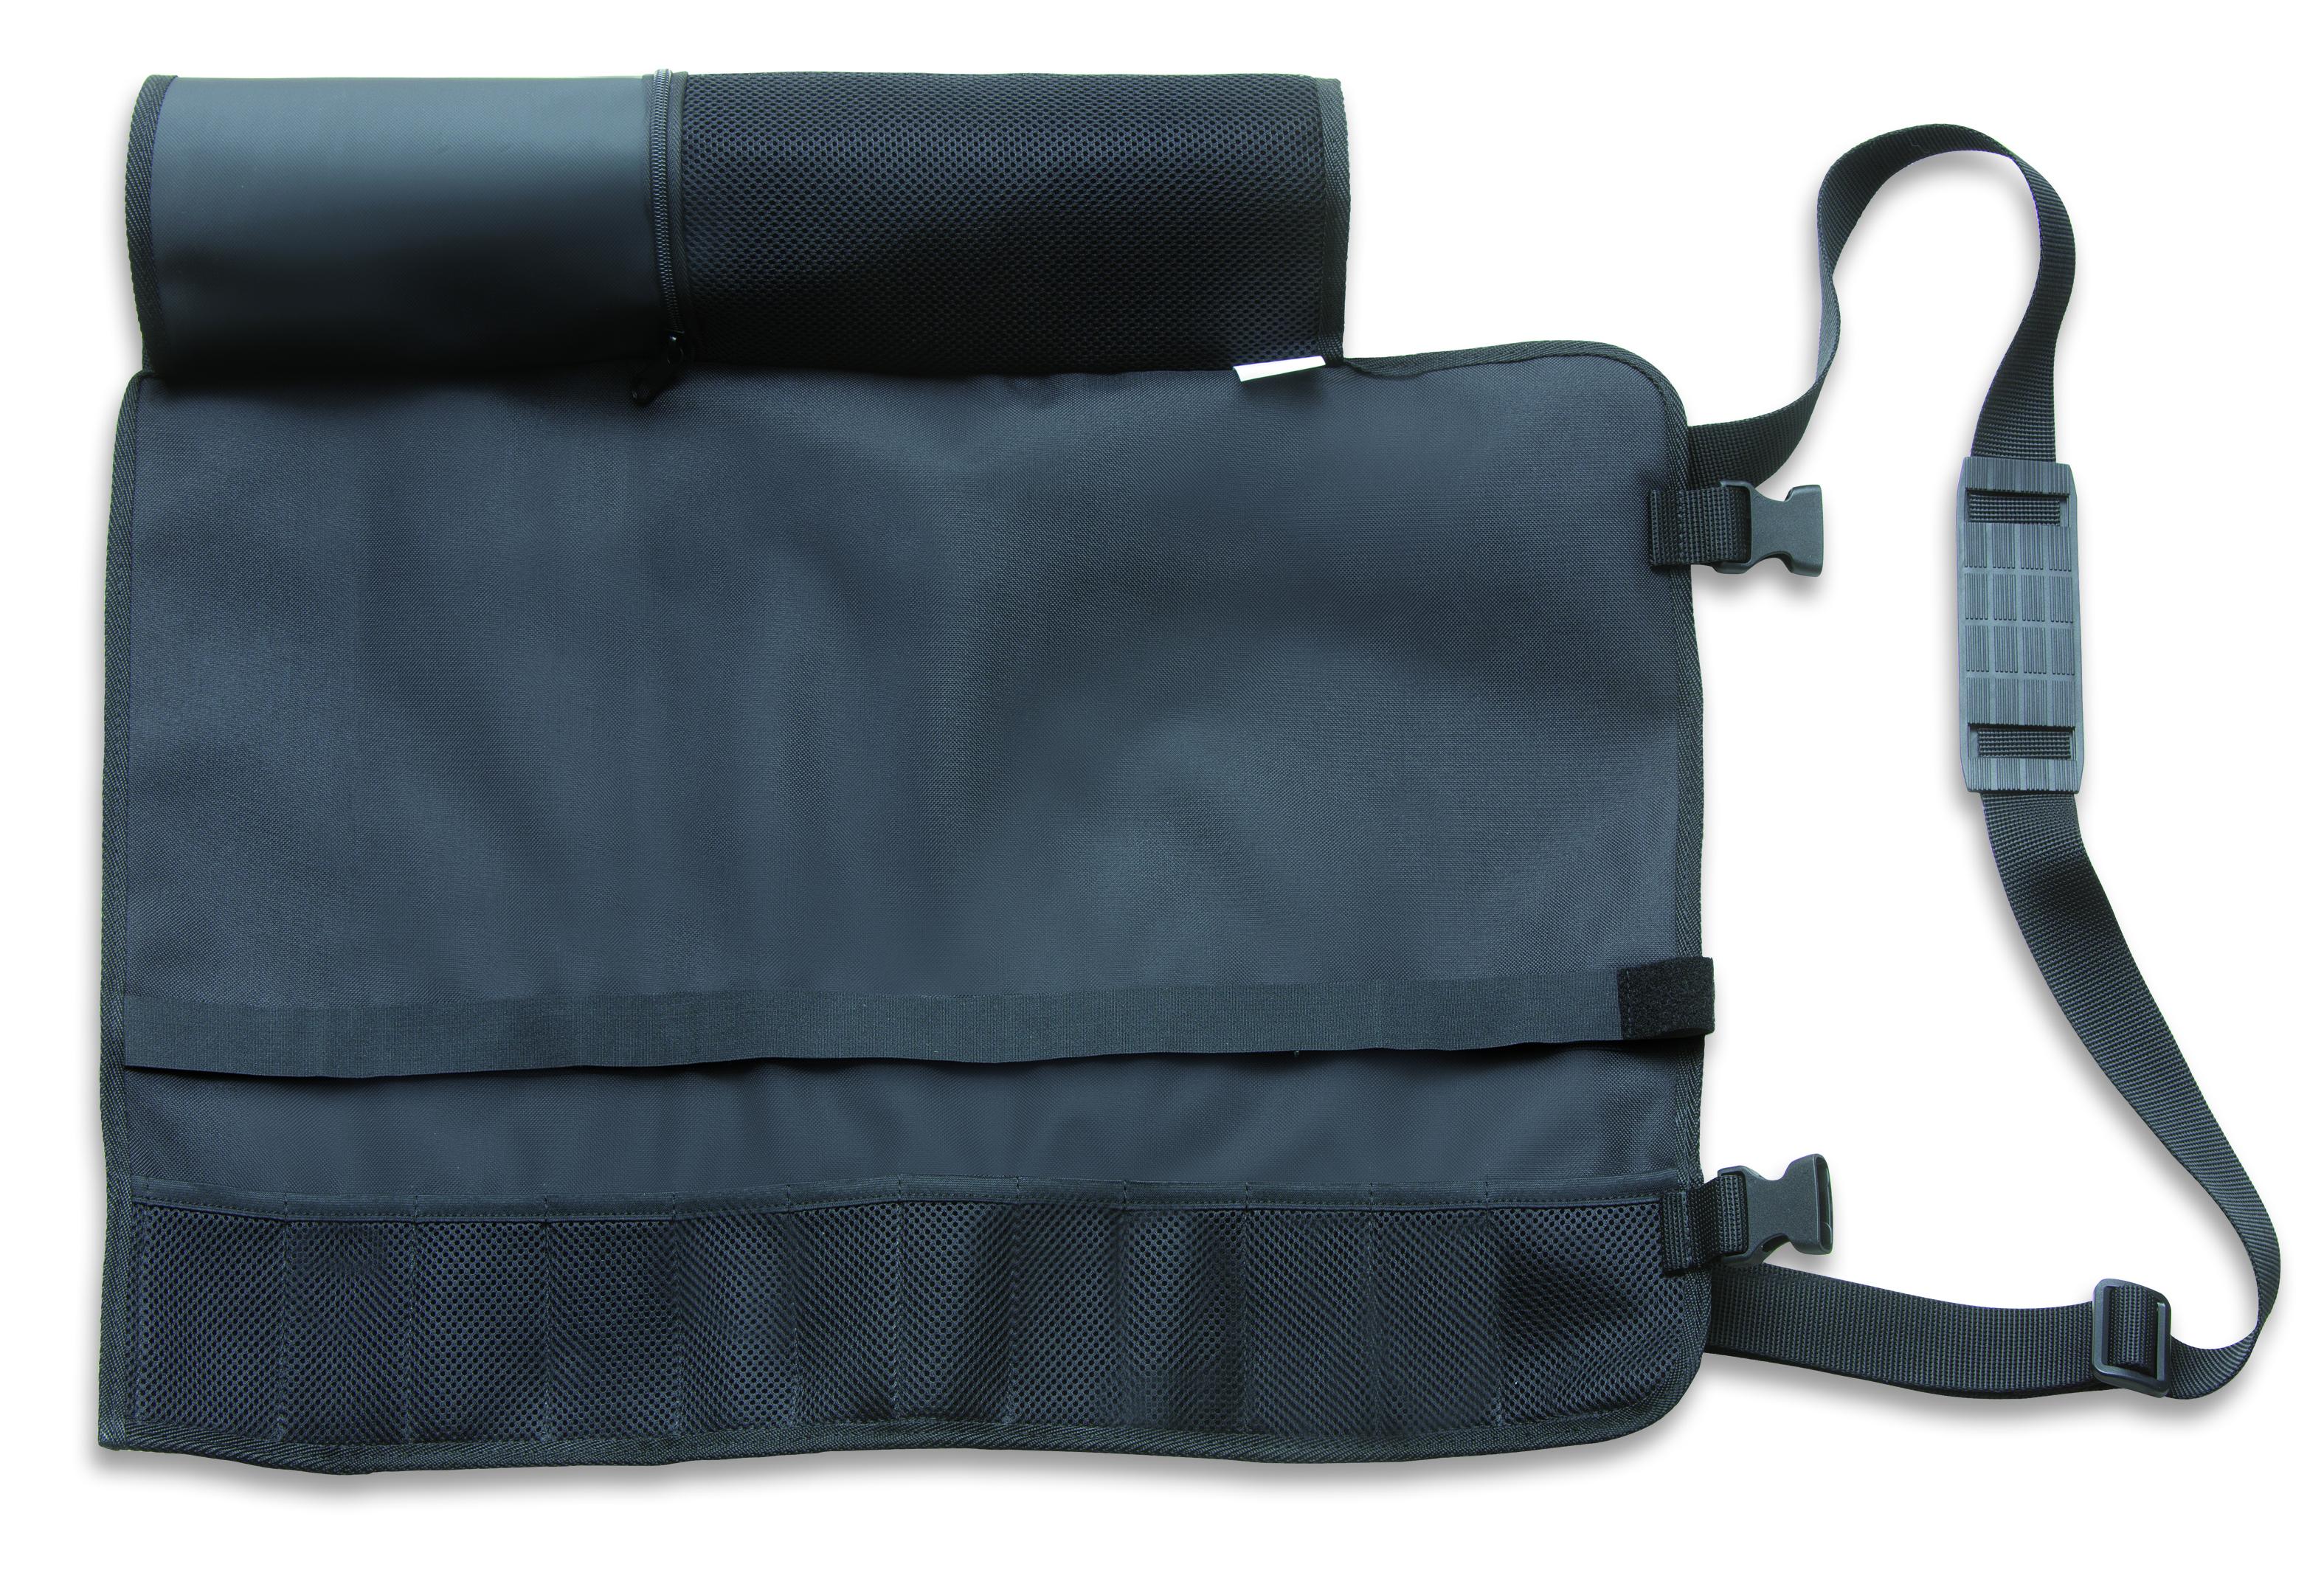 Textil-Rolltasche 12-tlg., waschbar, leer